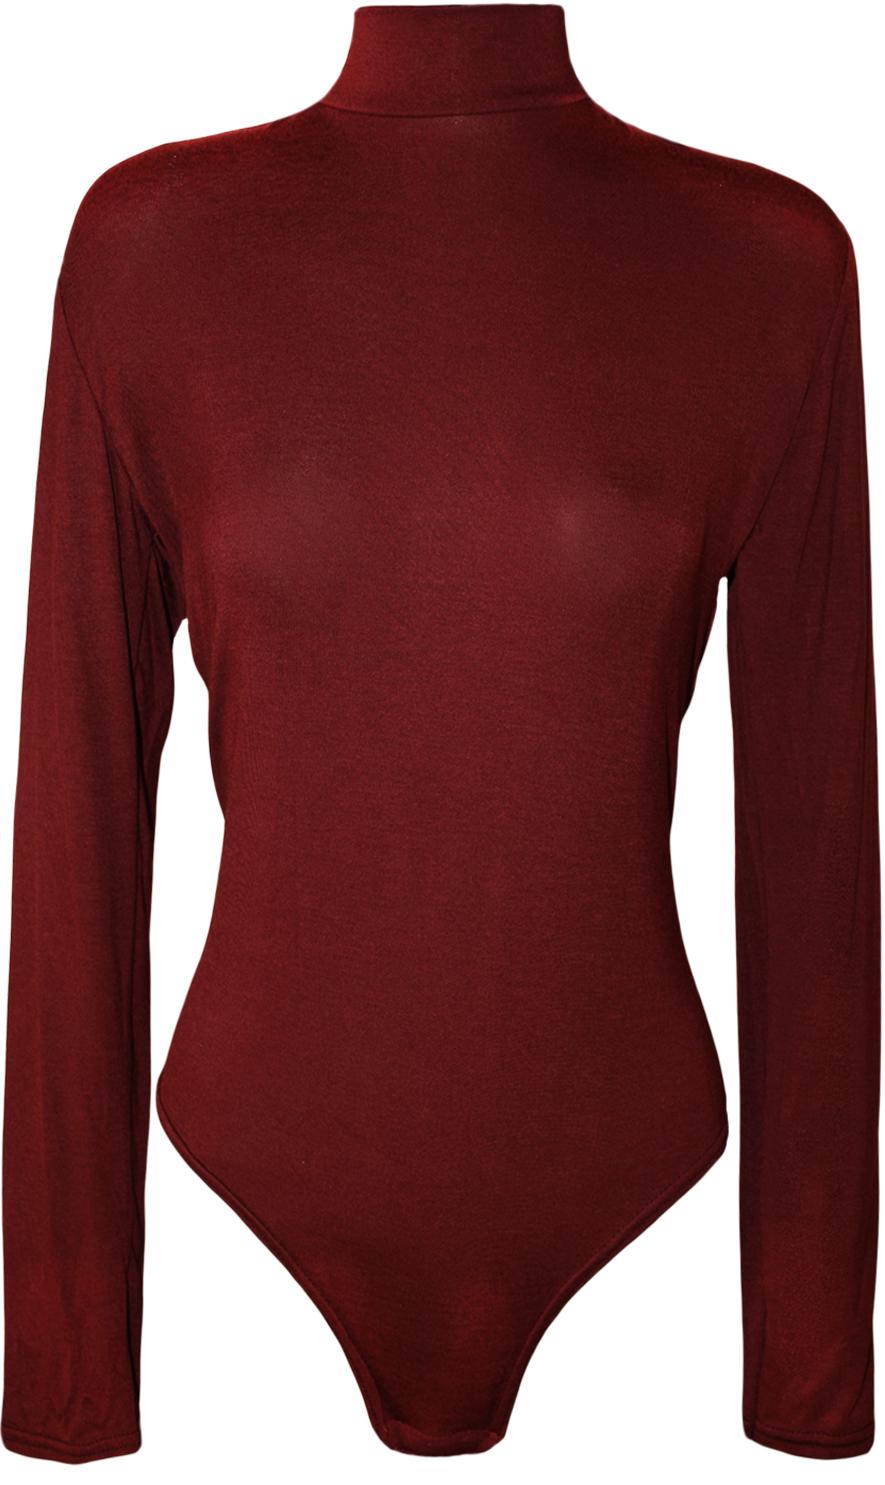 New-Plus-Size-Womens-Turtle-Neck-Bodysuit-Ladies-Long-Sleeve-Polo-Leotard-16-26